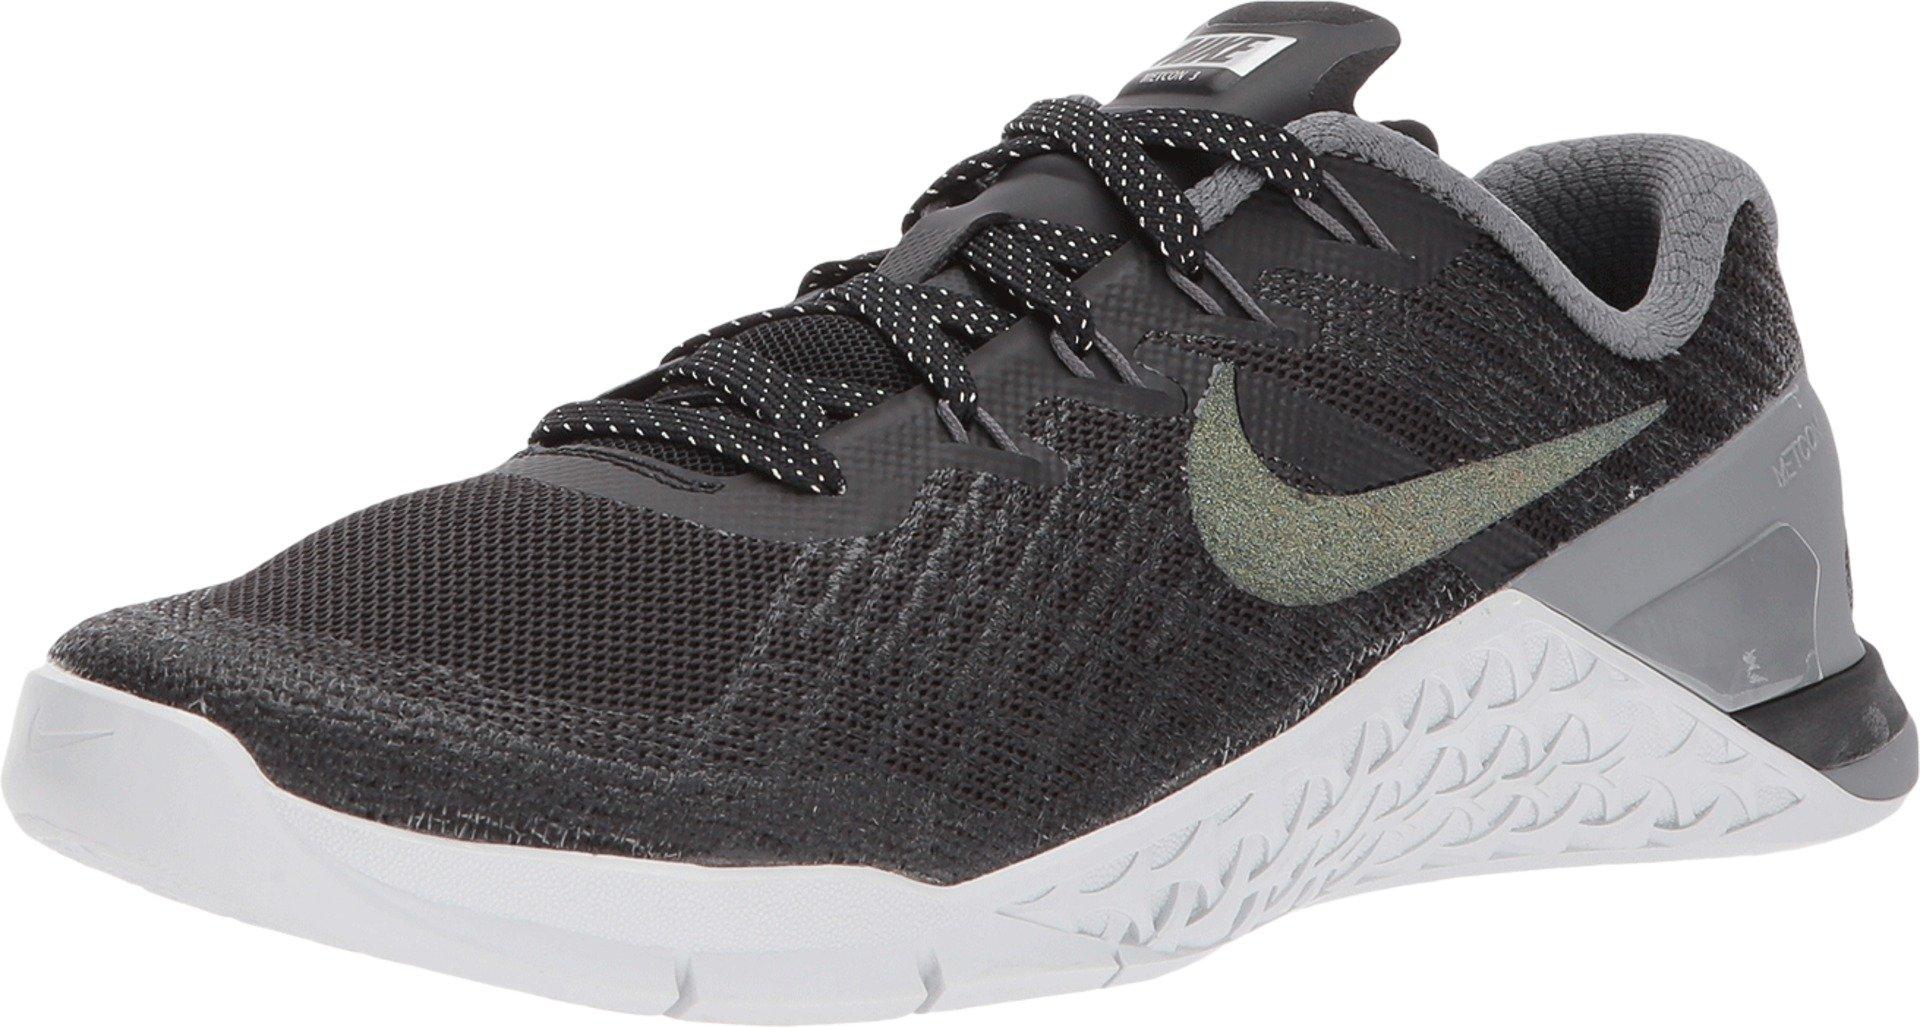 best sneakers 3097f 7865f Galleon - Nike Womens Metcon 3 Metallic Running Trainers 922880 Sneakers  Shoes (UK 7 US 9.5 EU 41, Black Multi Color 001)